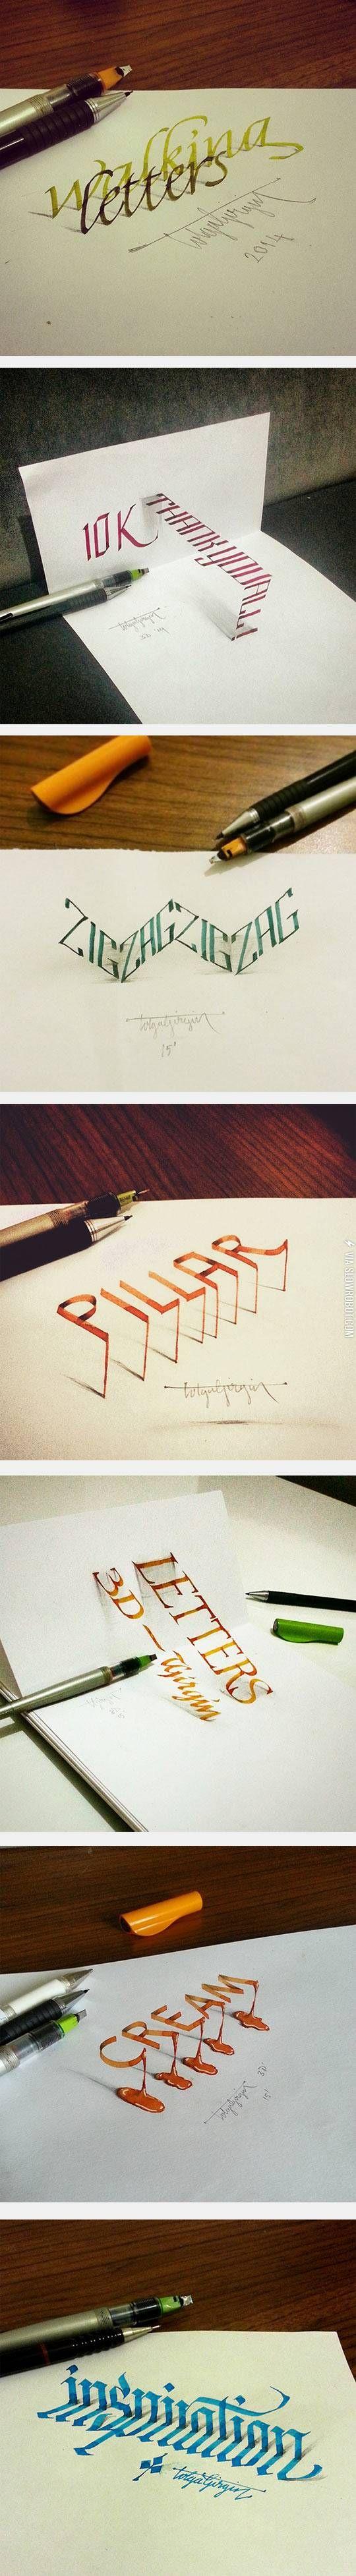 3D calligraphy.